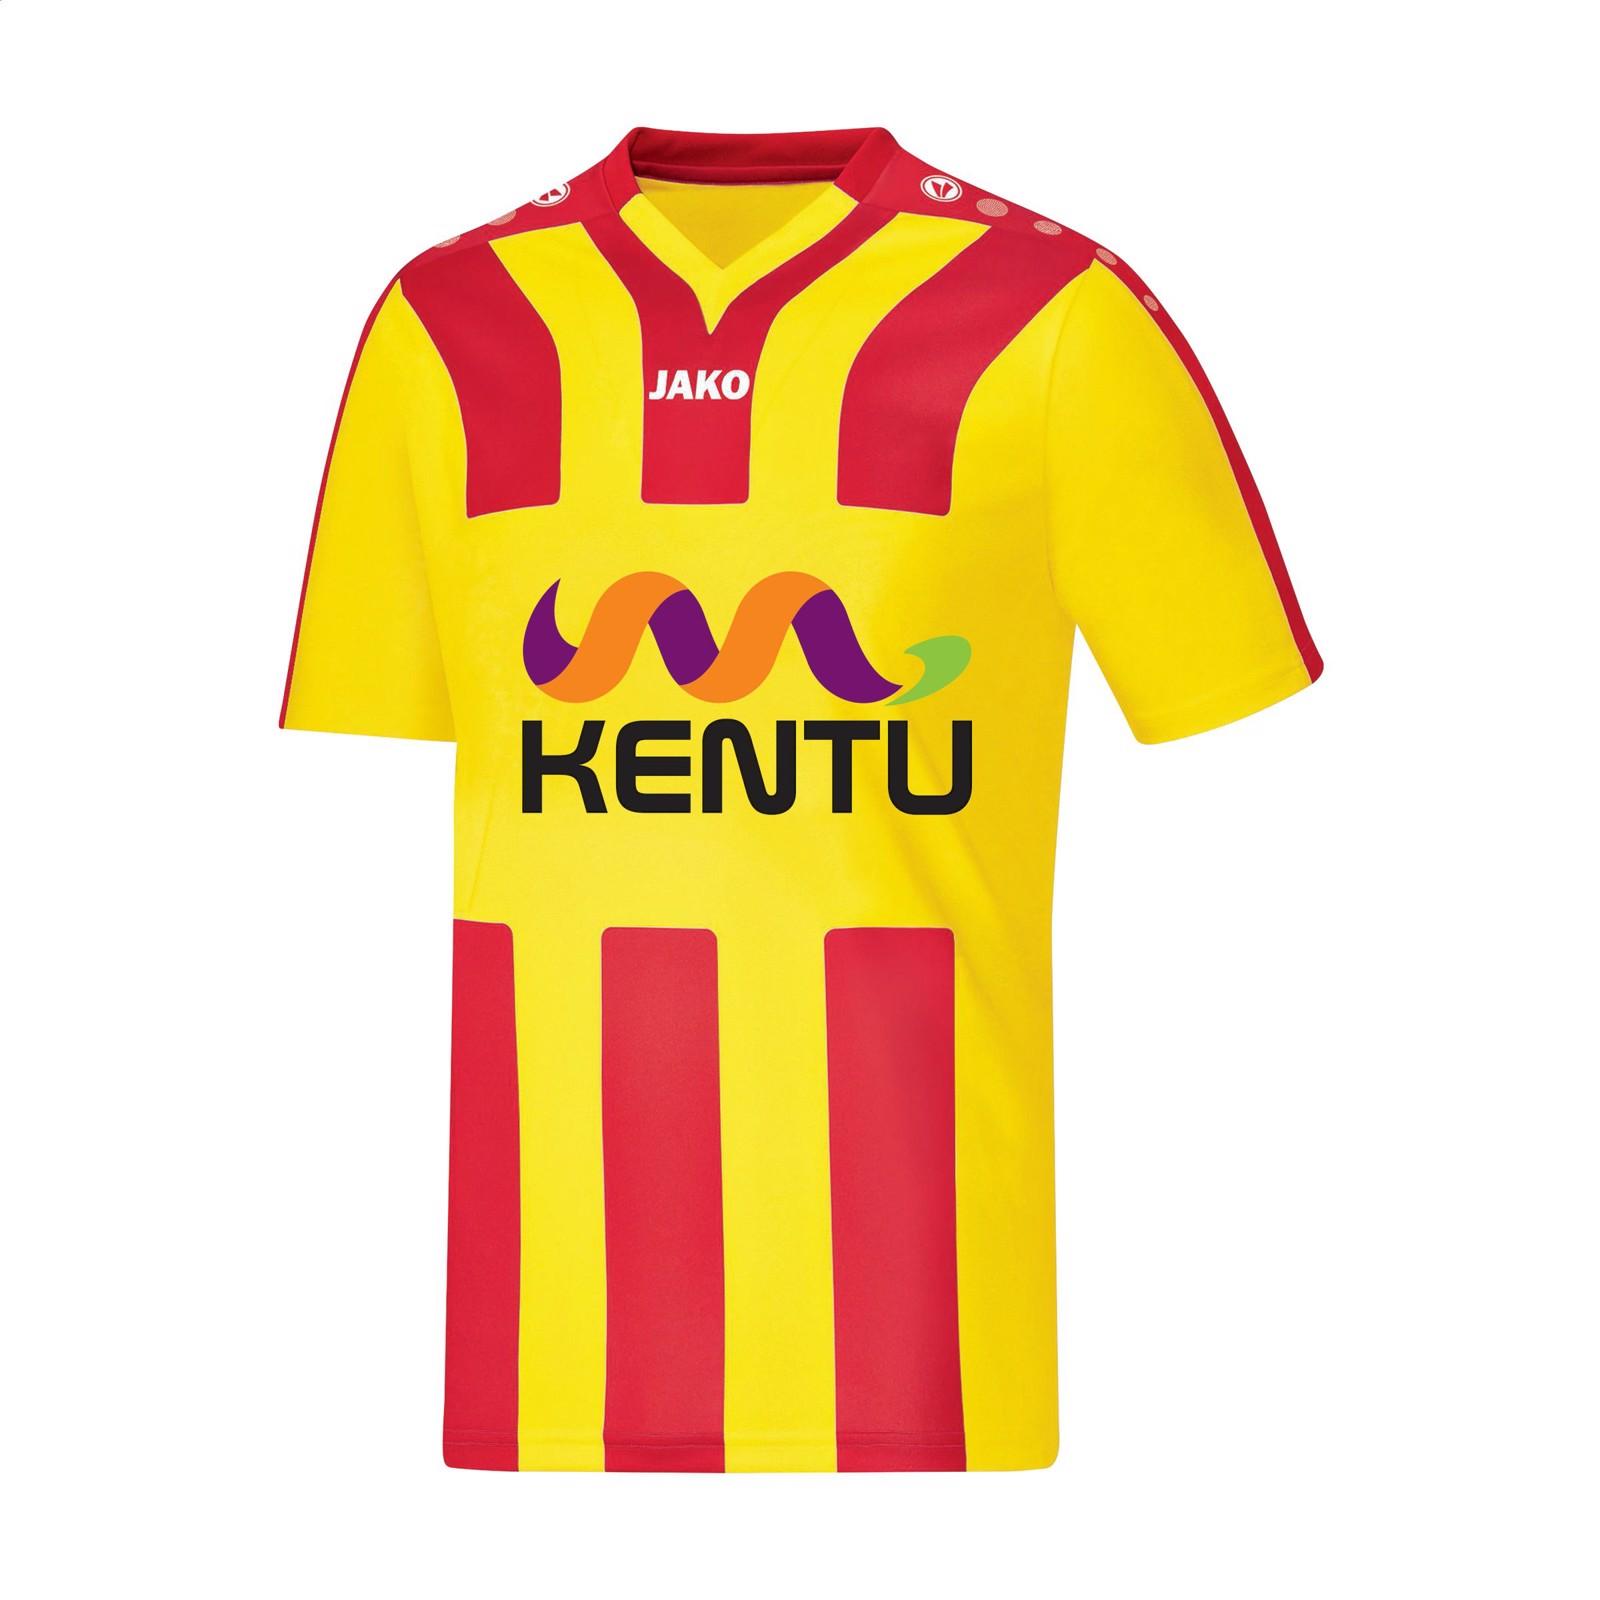 Jako® Shirt Santos KM mens sportshirt - Yellow / Red / M